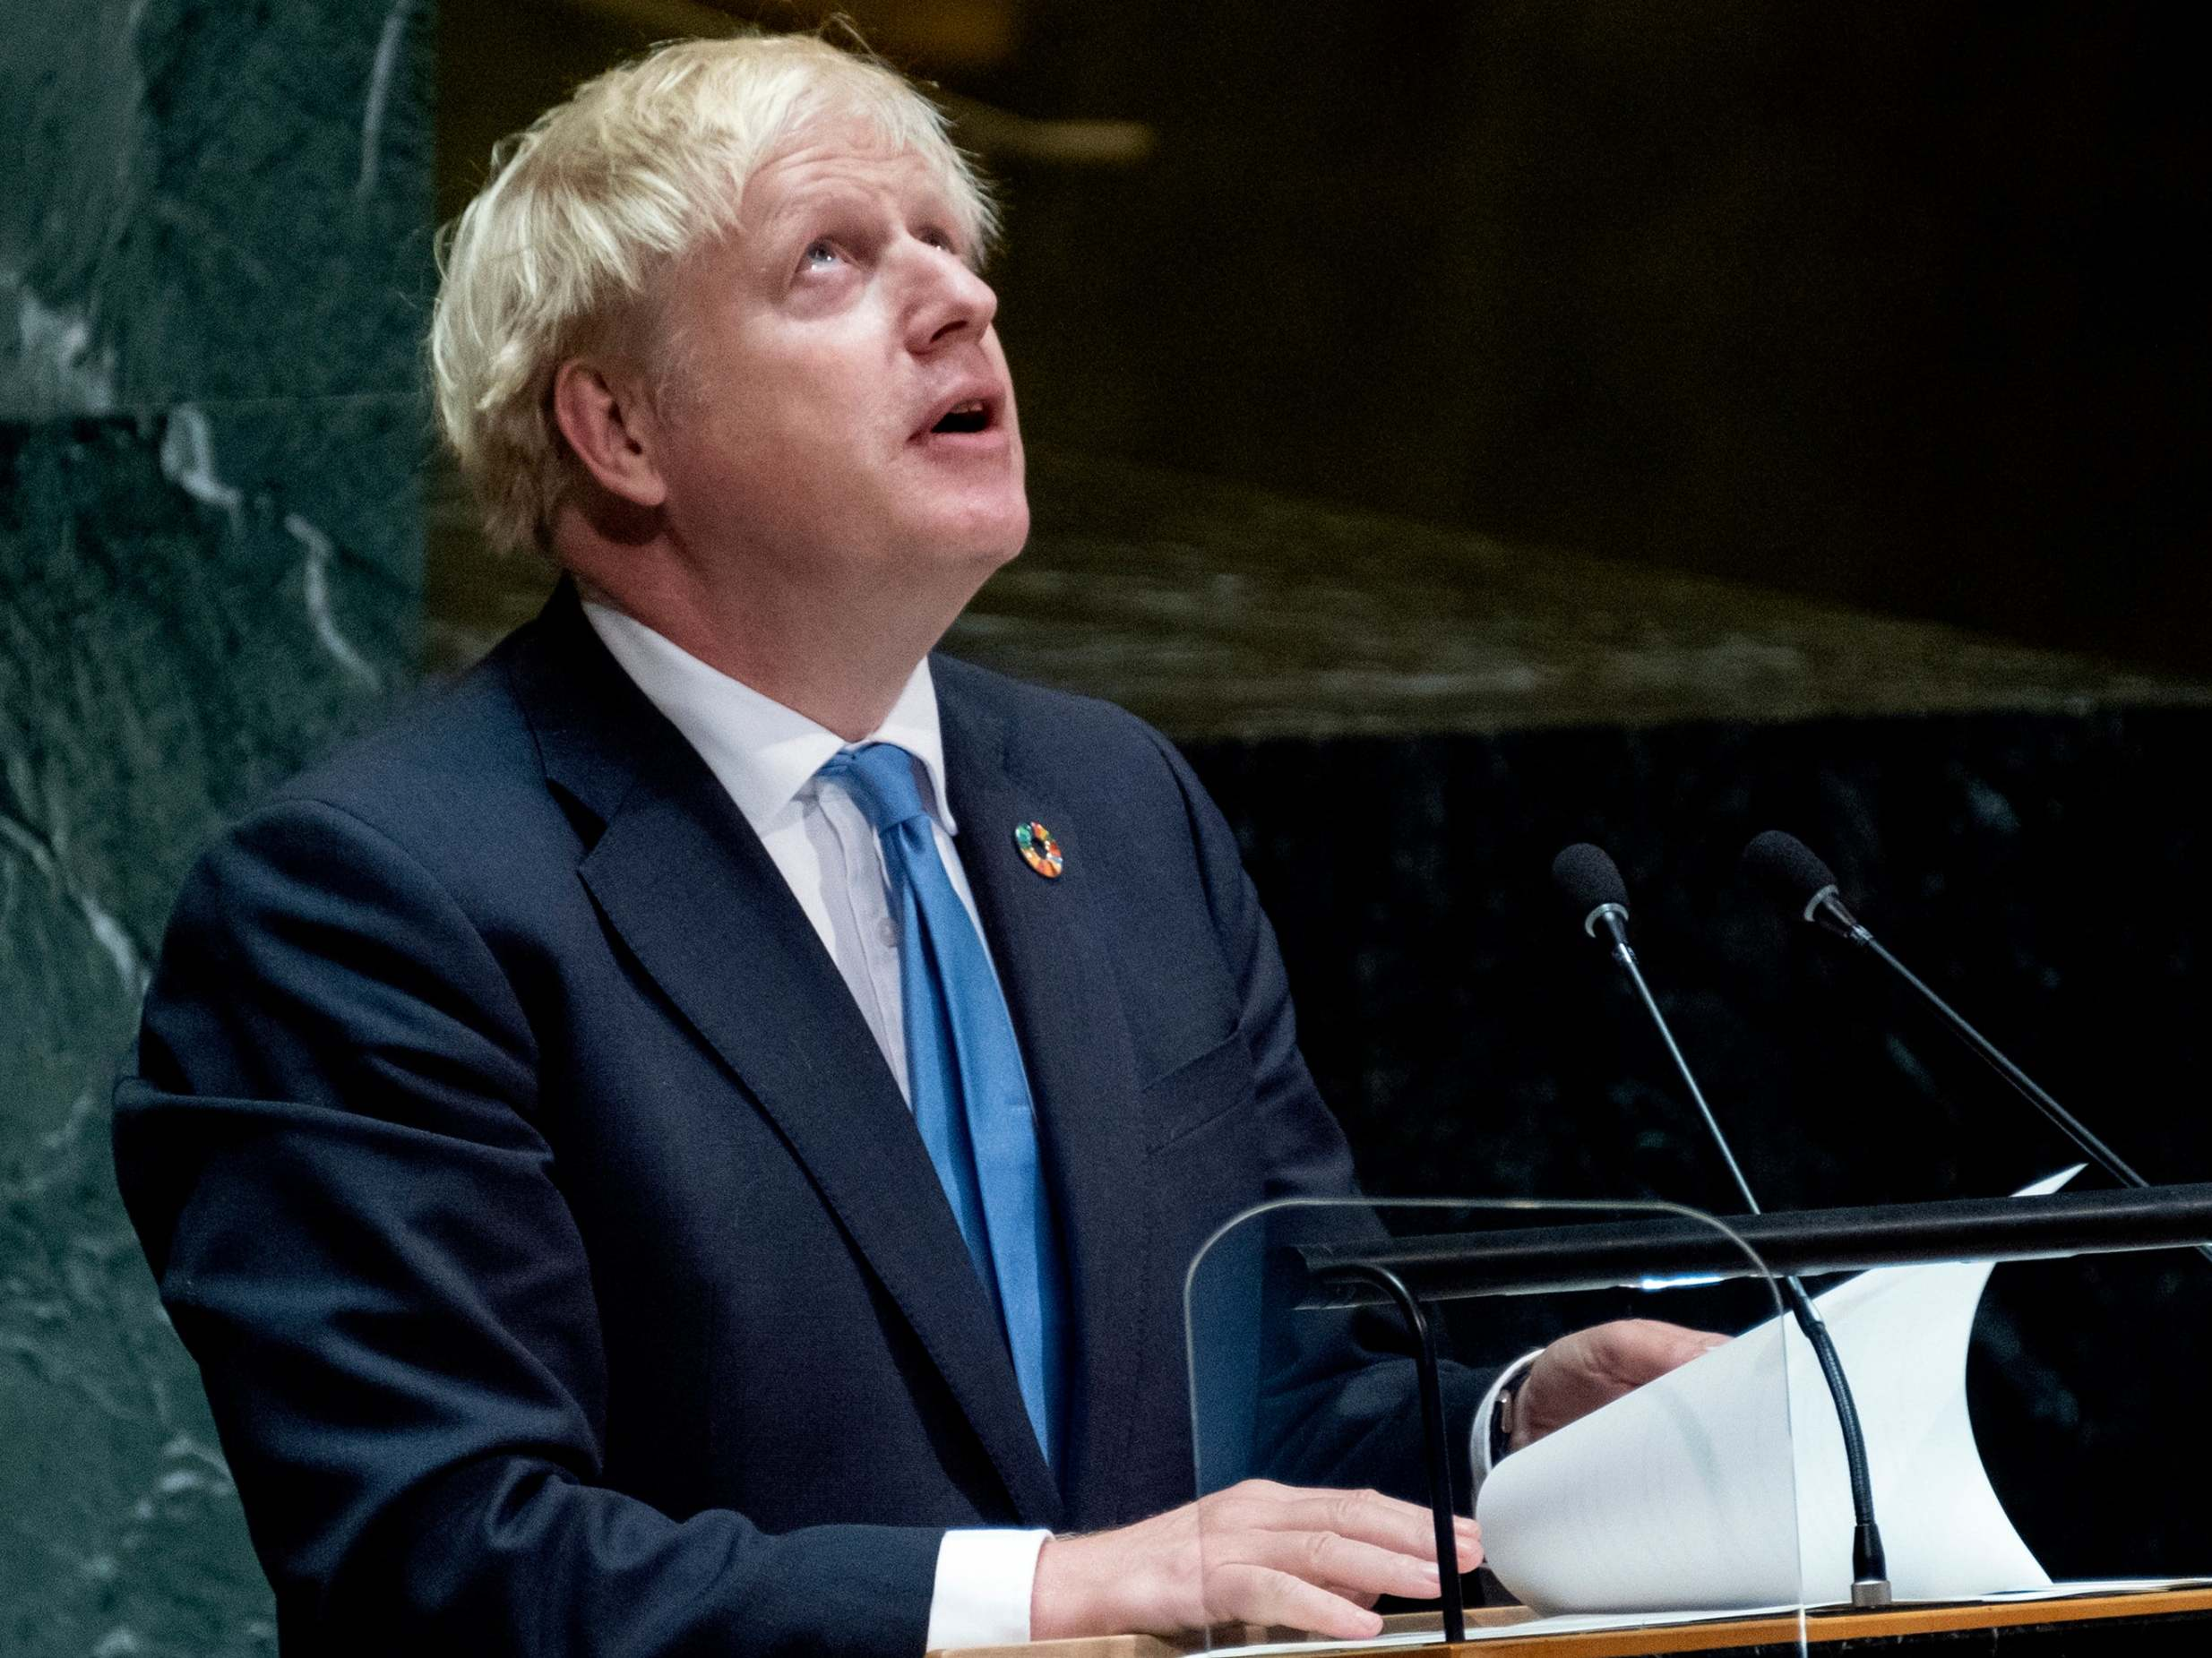 Boris Johnson delivers bizarre speech to UN warning of